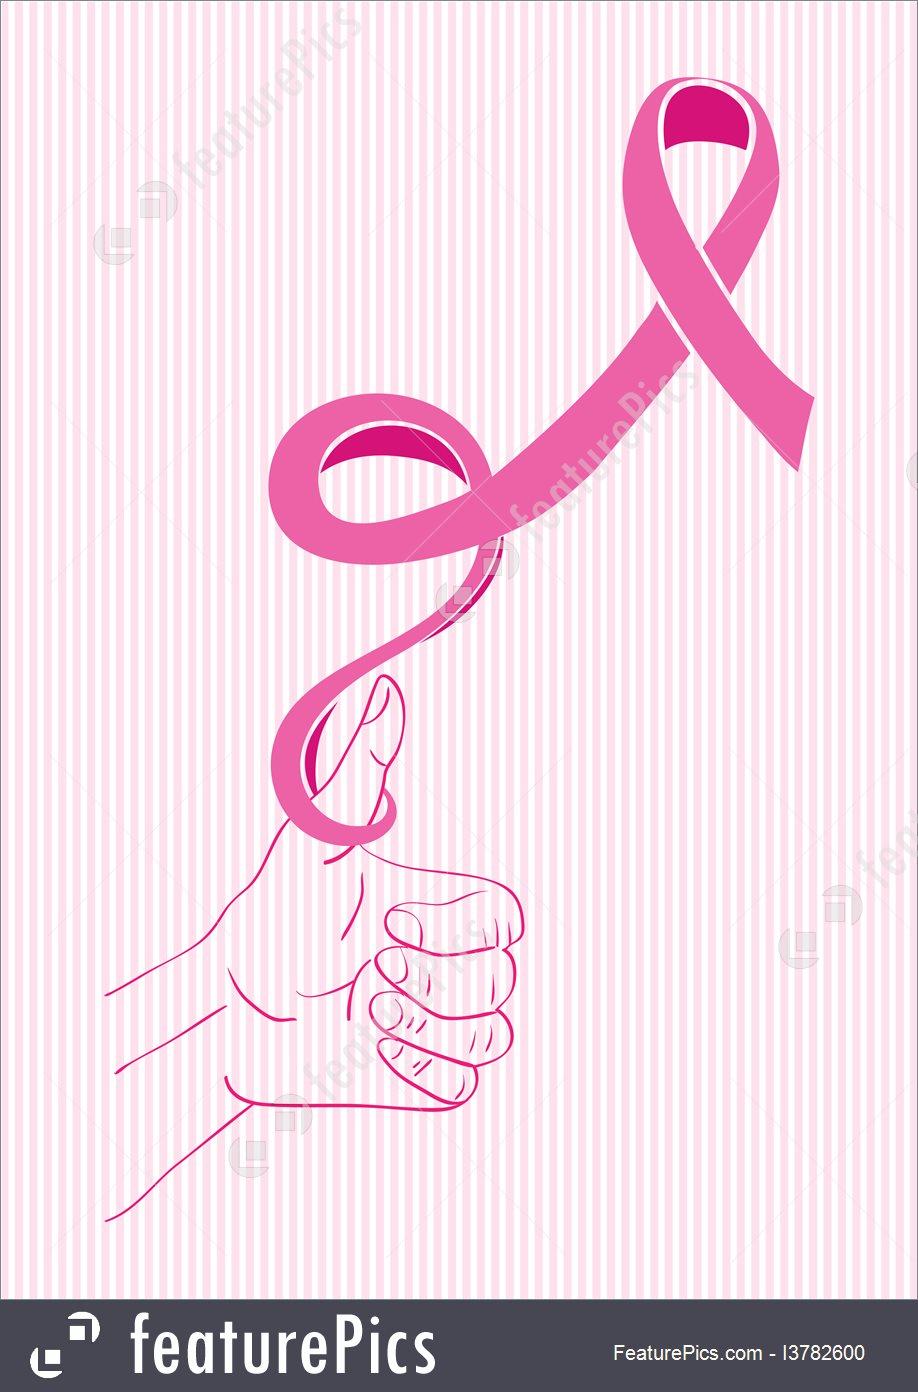 918x1392 Emblems And Symbols Breast Cancer Awareness Ribbon Human Hand